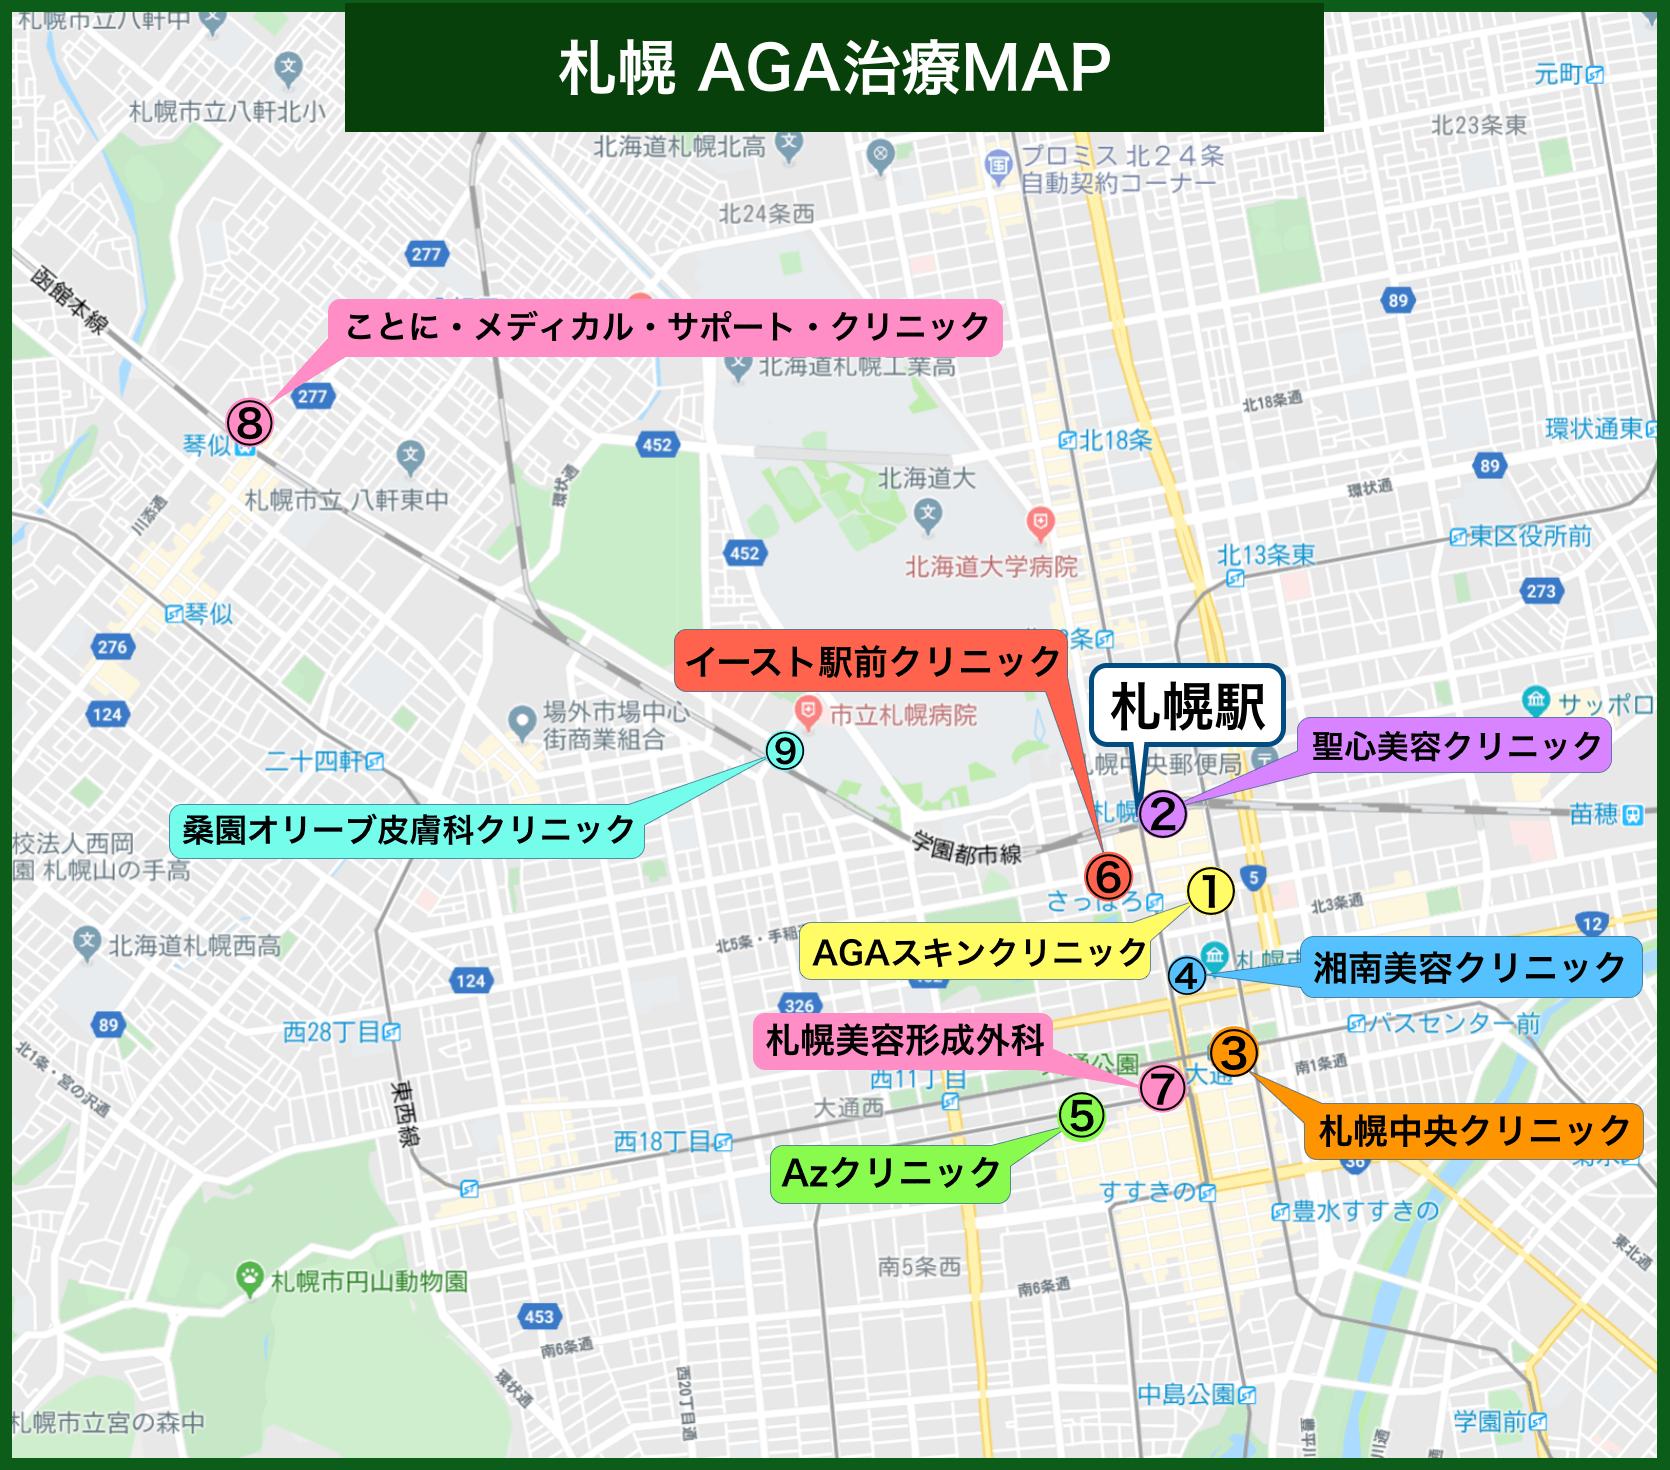 札幌AGA治療MAP(2020年版)